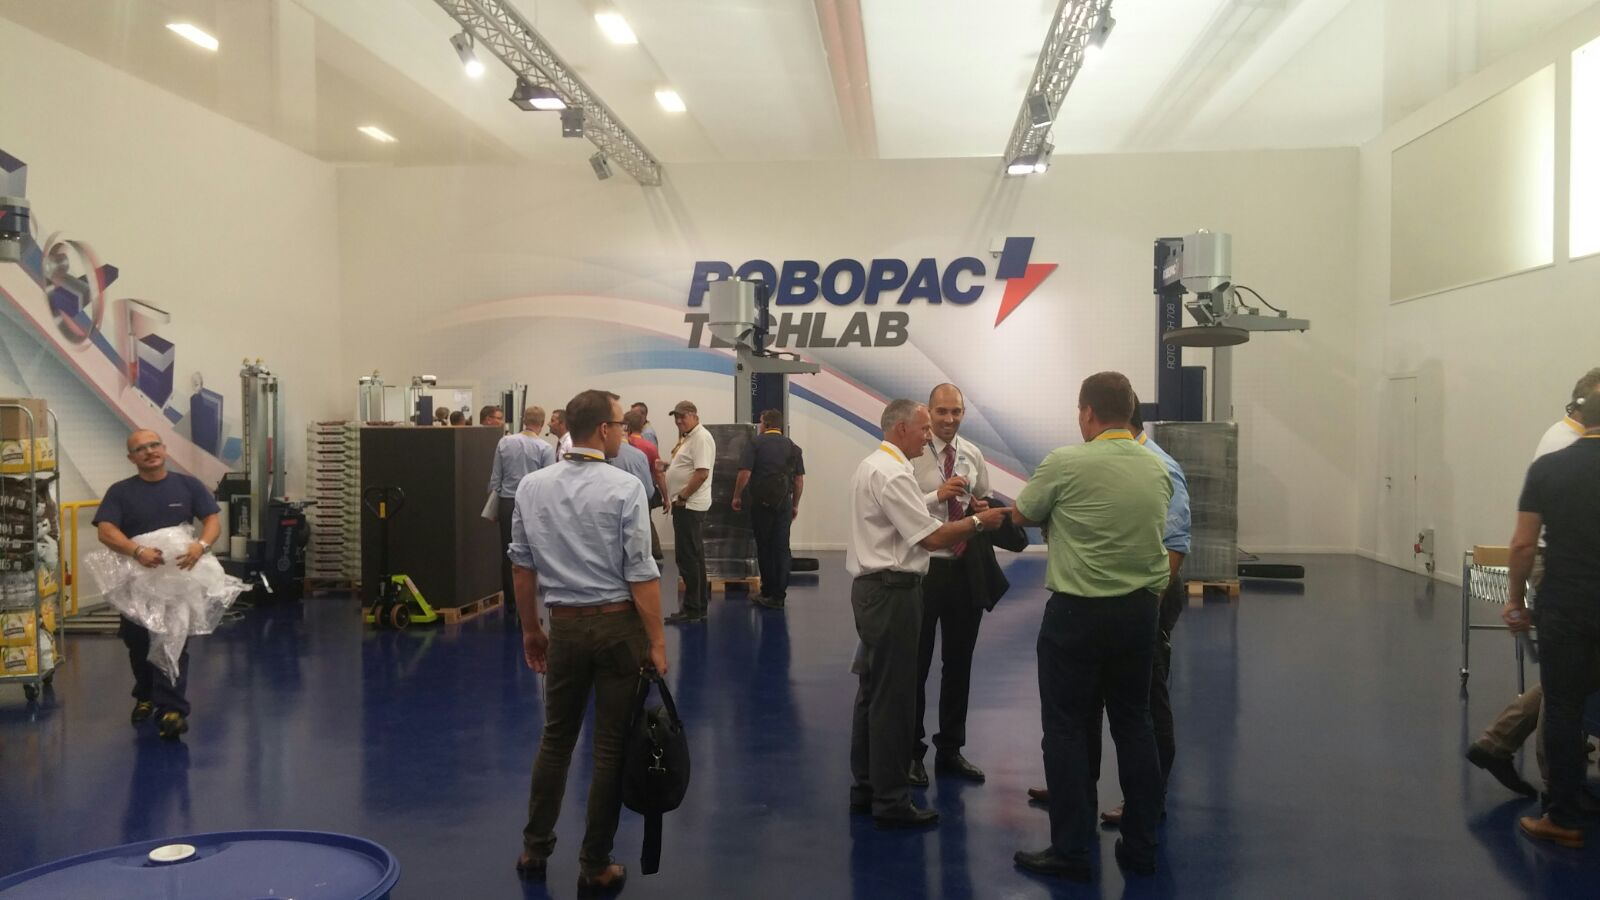 robopac tech lab